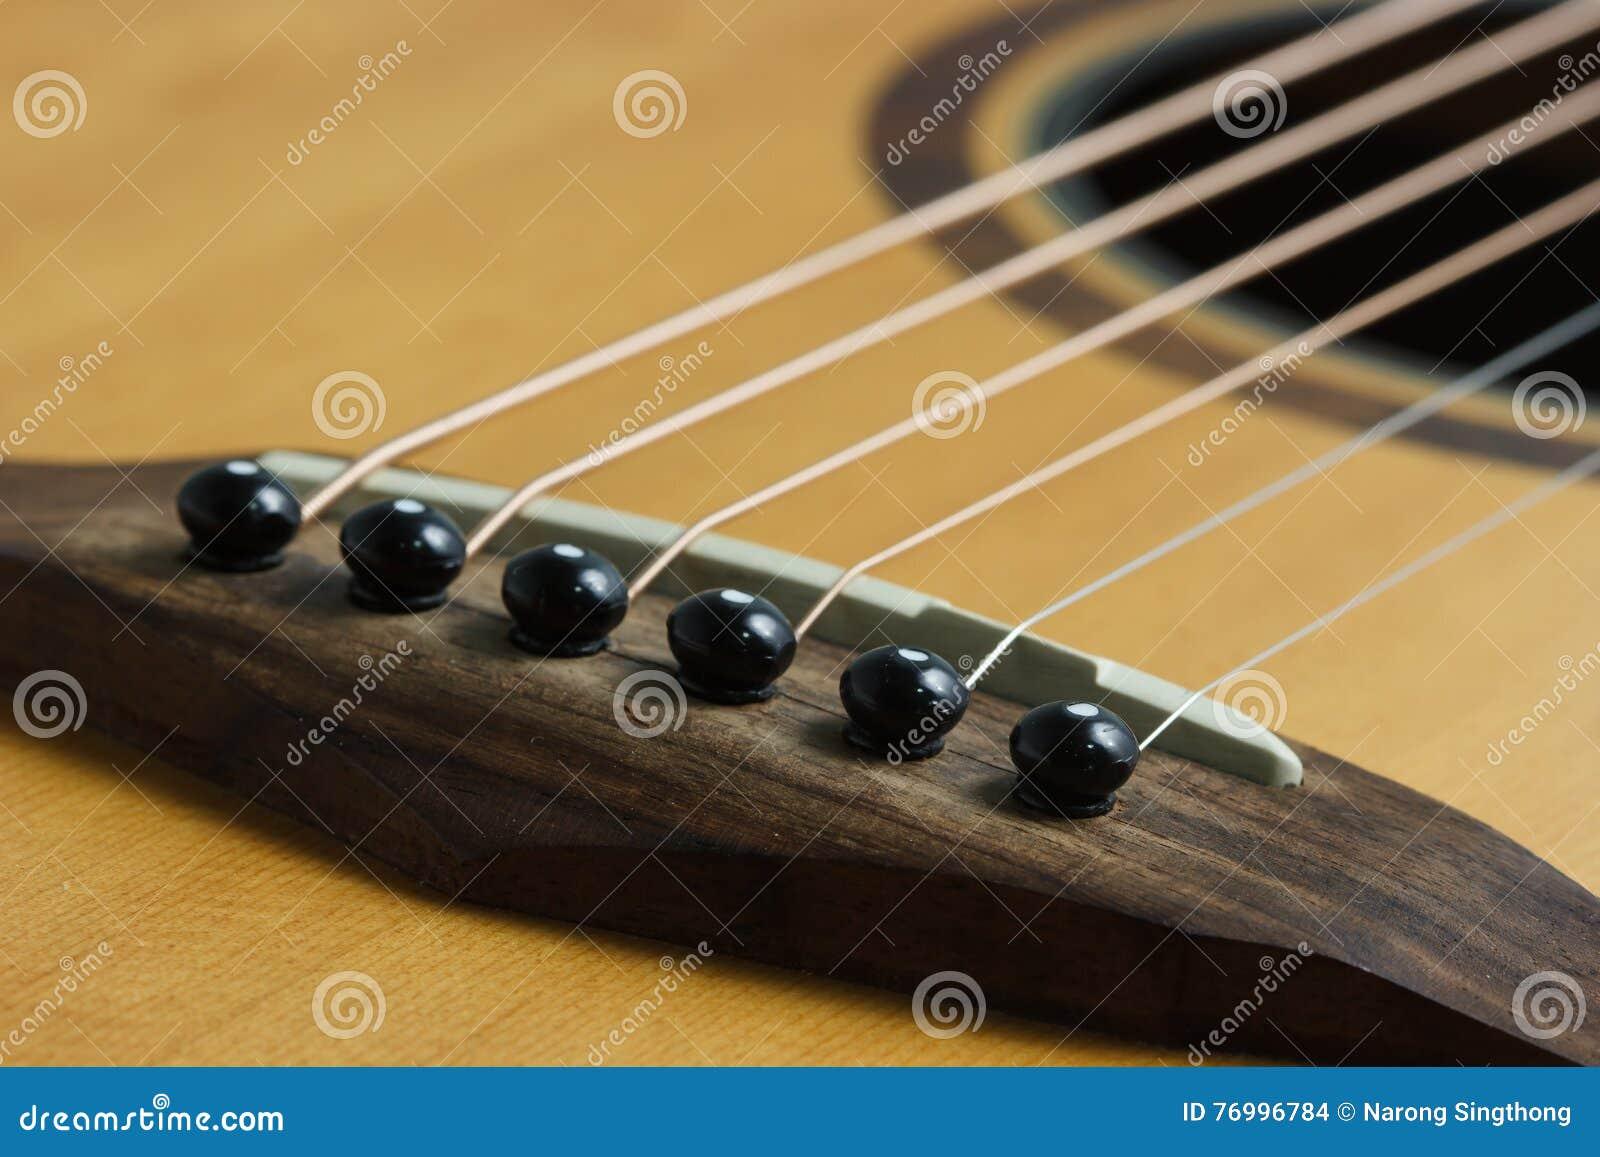 Acoustic Guitar Bridge Pins And Saddle Select Focus Stock Photo